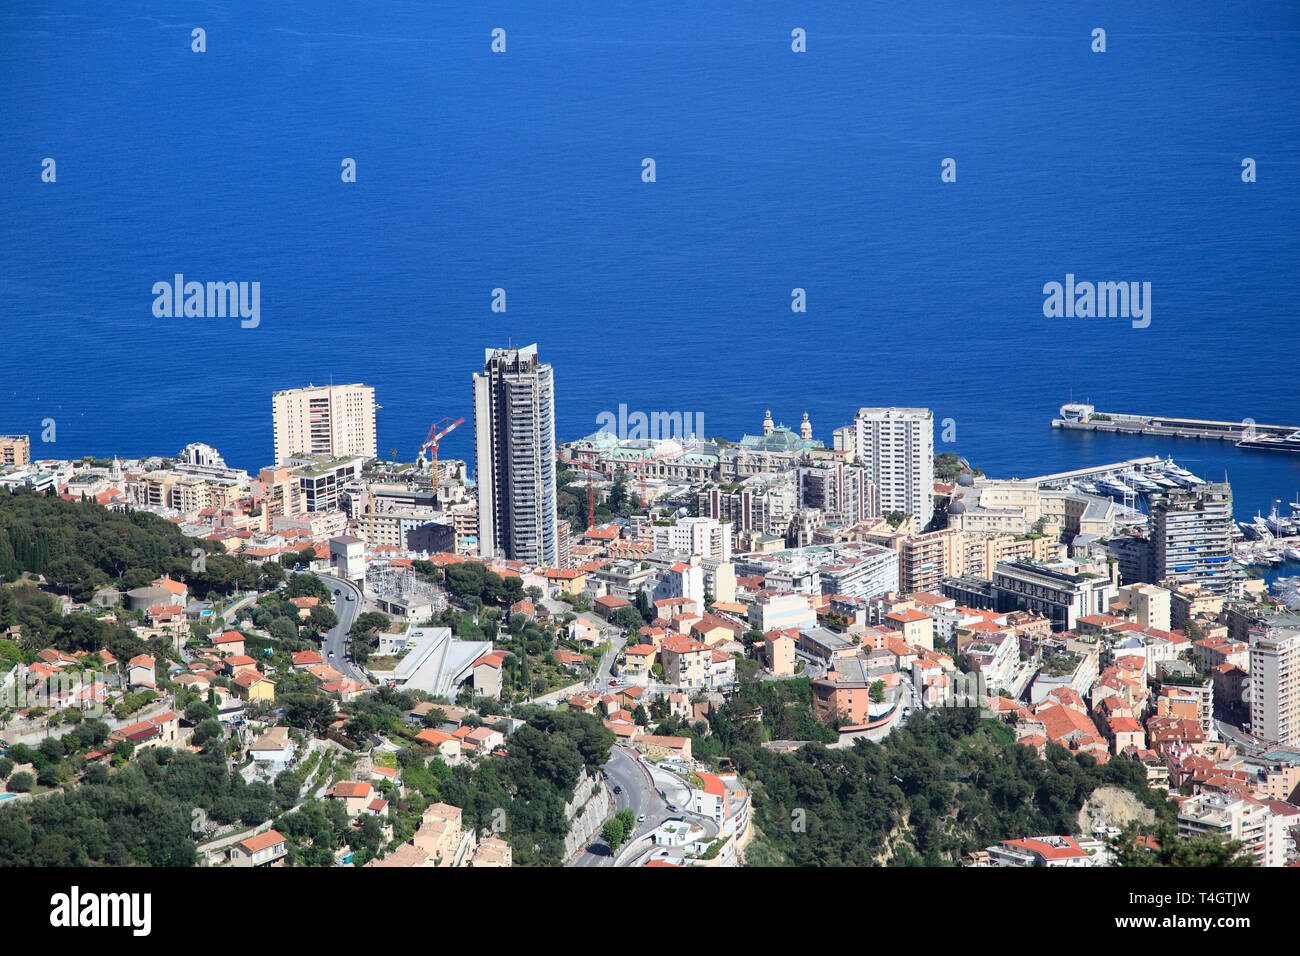 Monte Carlo, Monaco, Cote d'Azur, Mediterranean, Europe - Stock Image